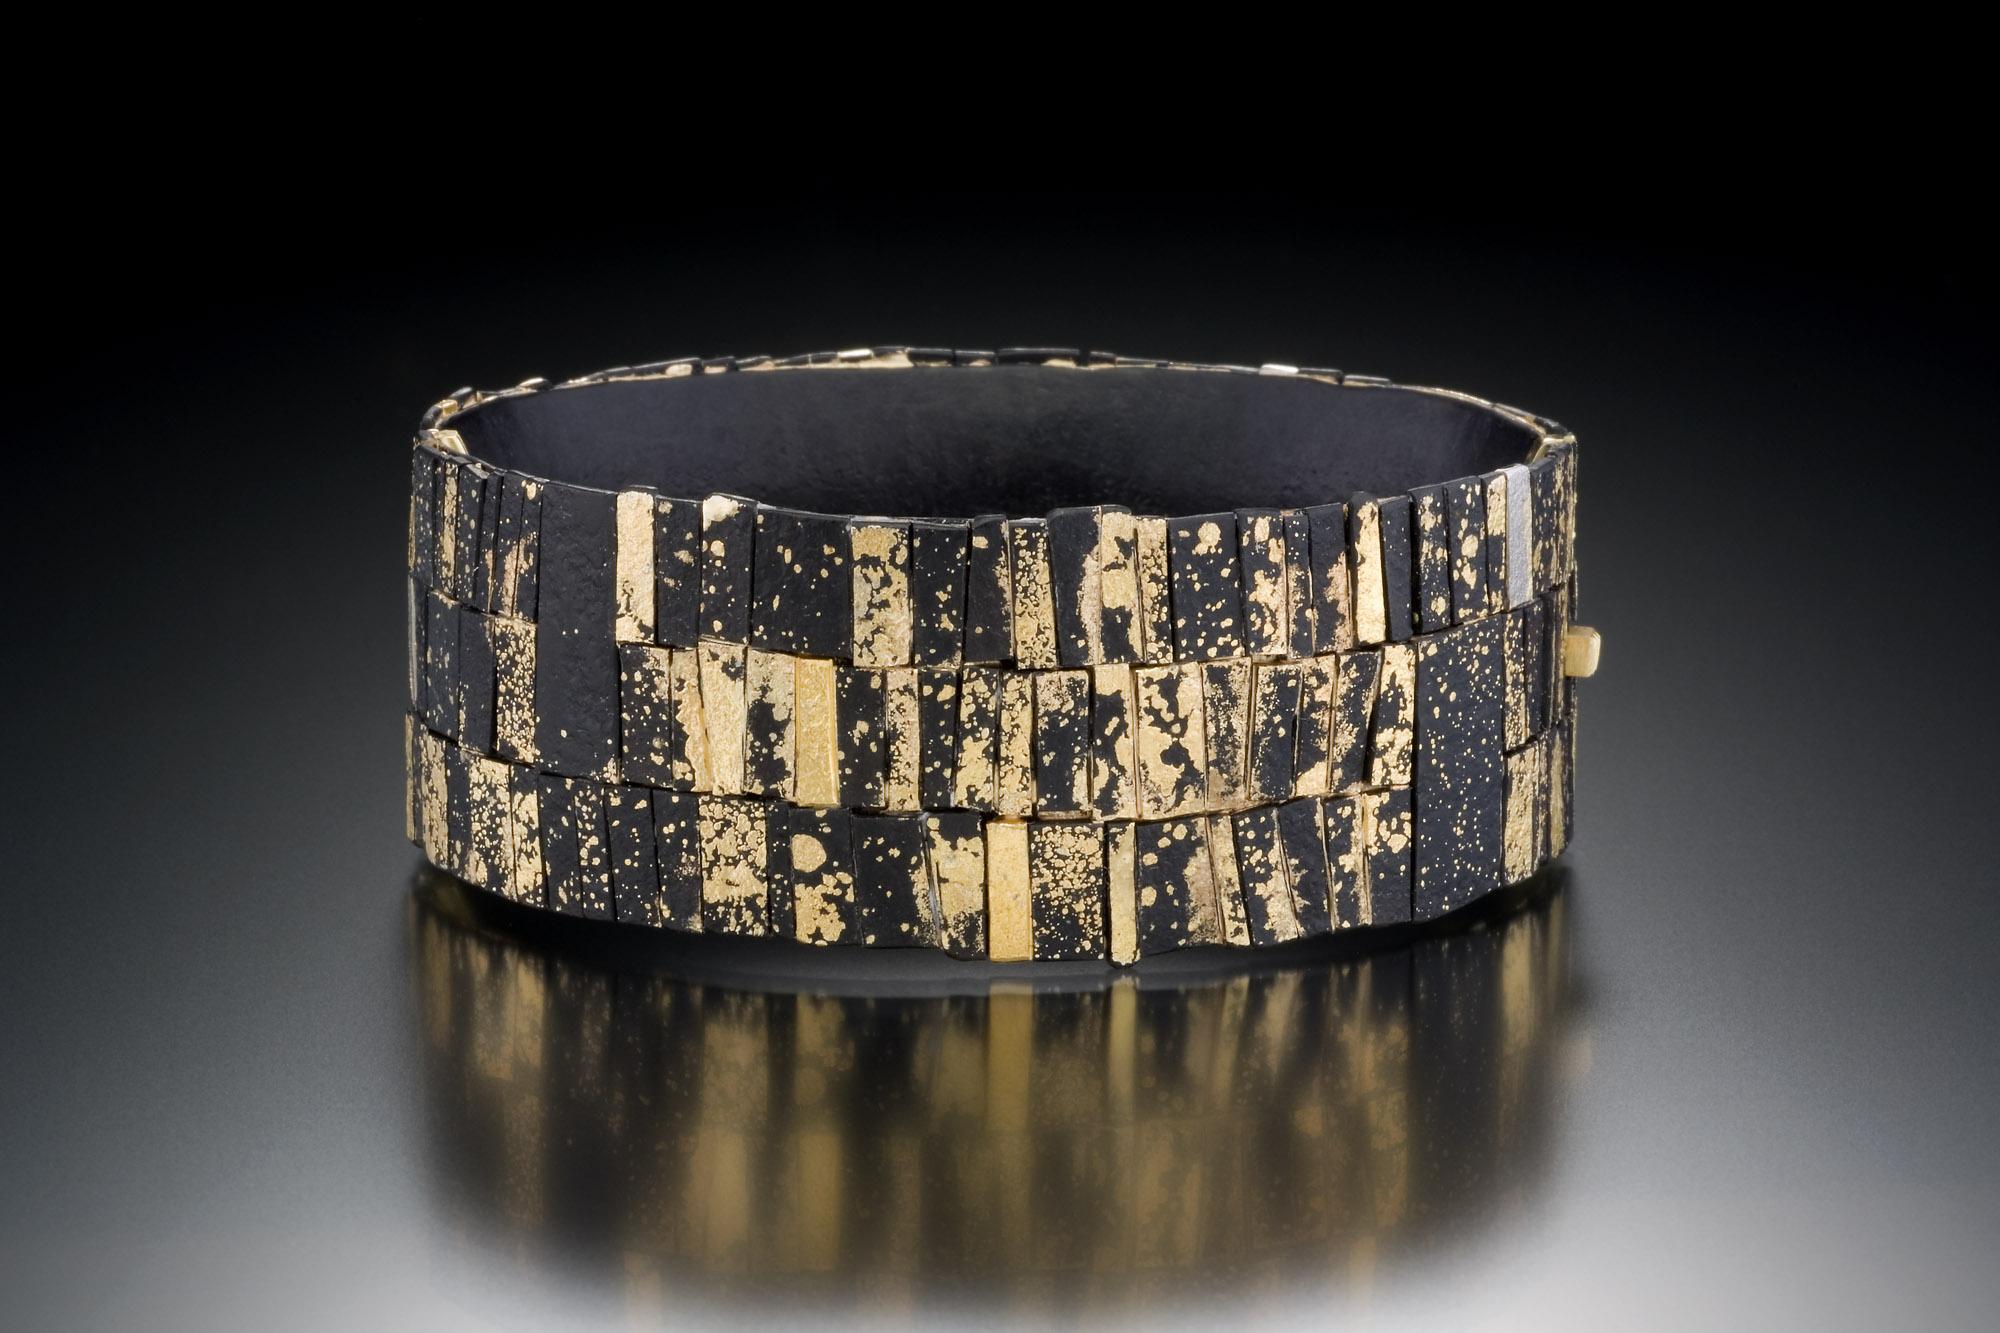 Mosaic Locking Bracelet